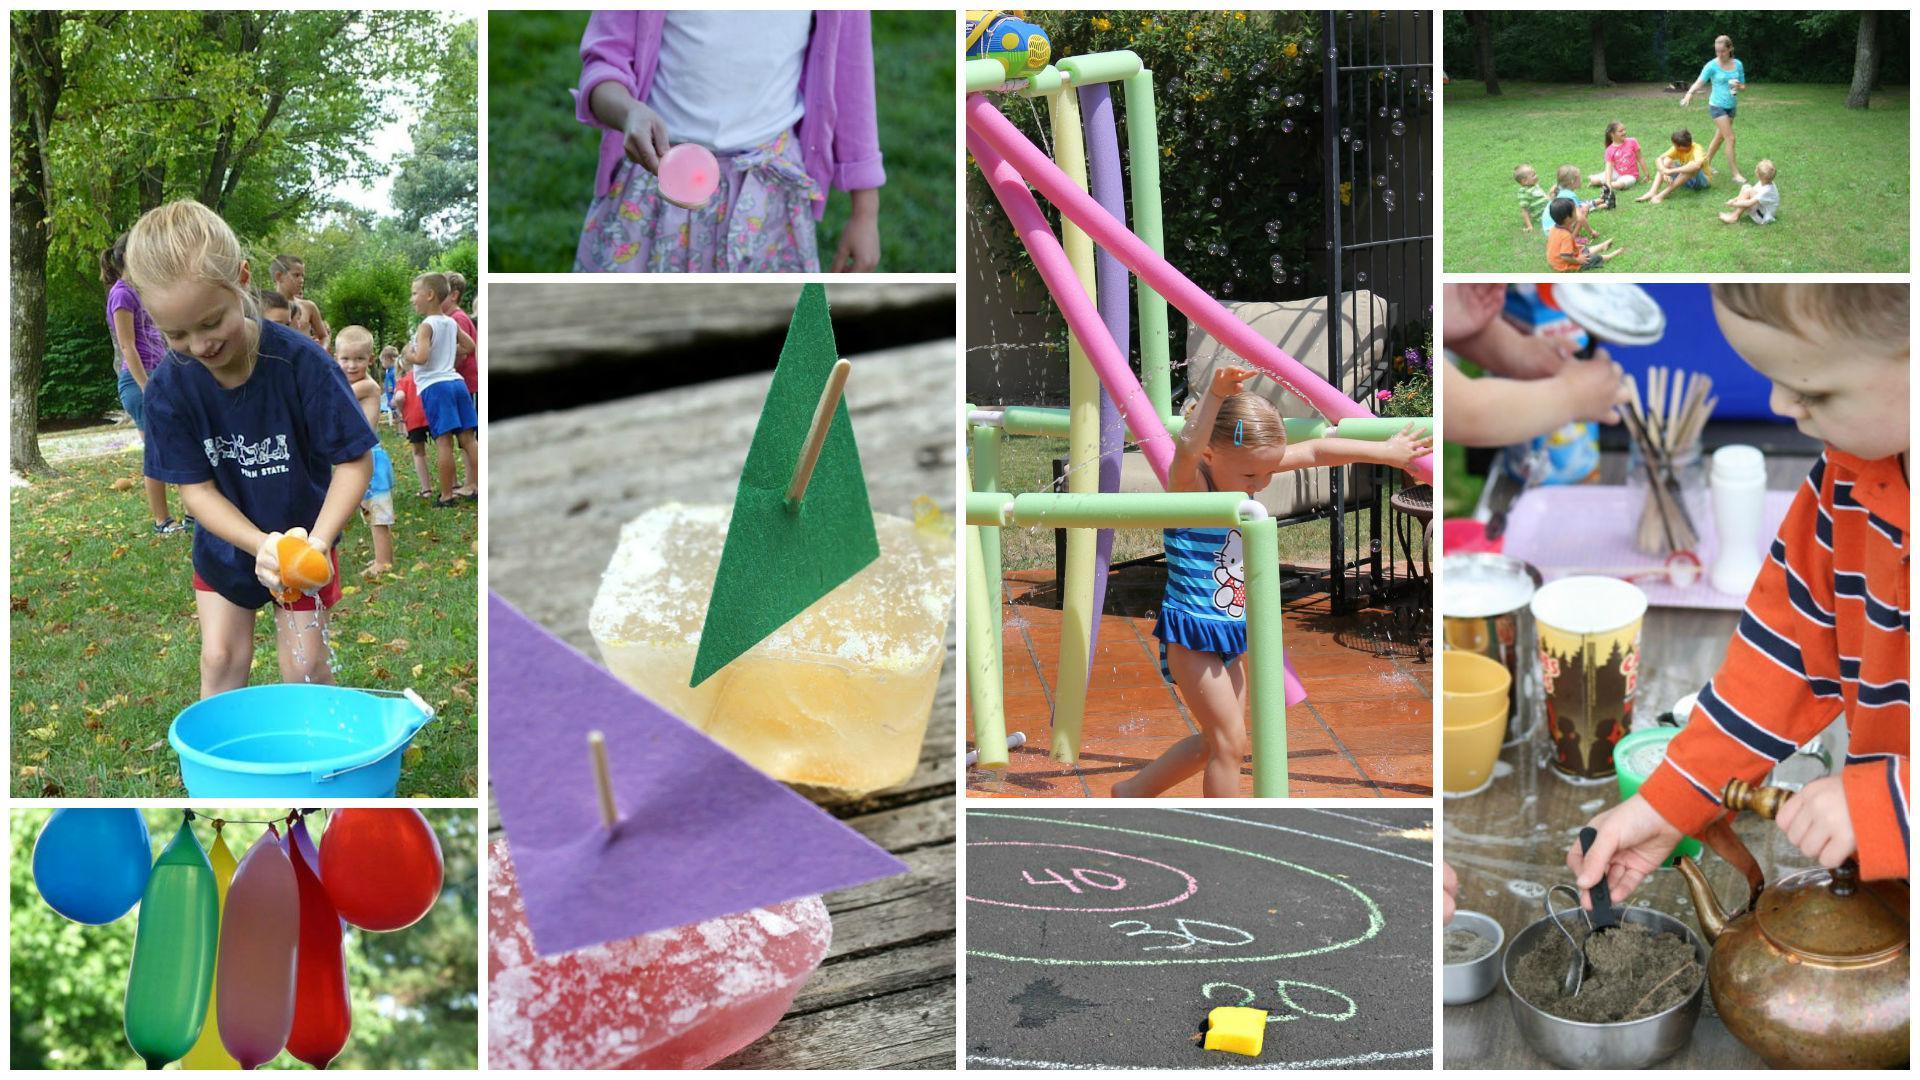 fun-water-games-that-keep-kids-cool-in-the-summer.jpg